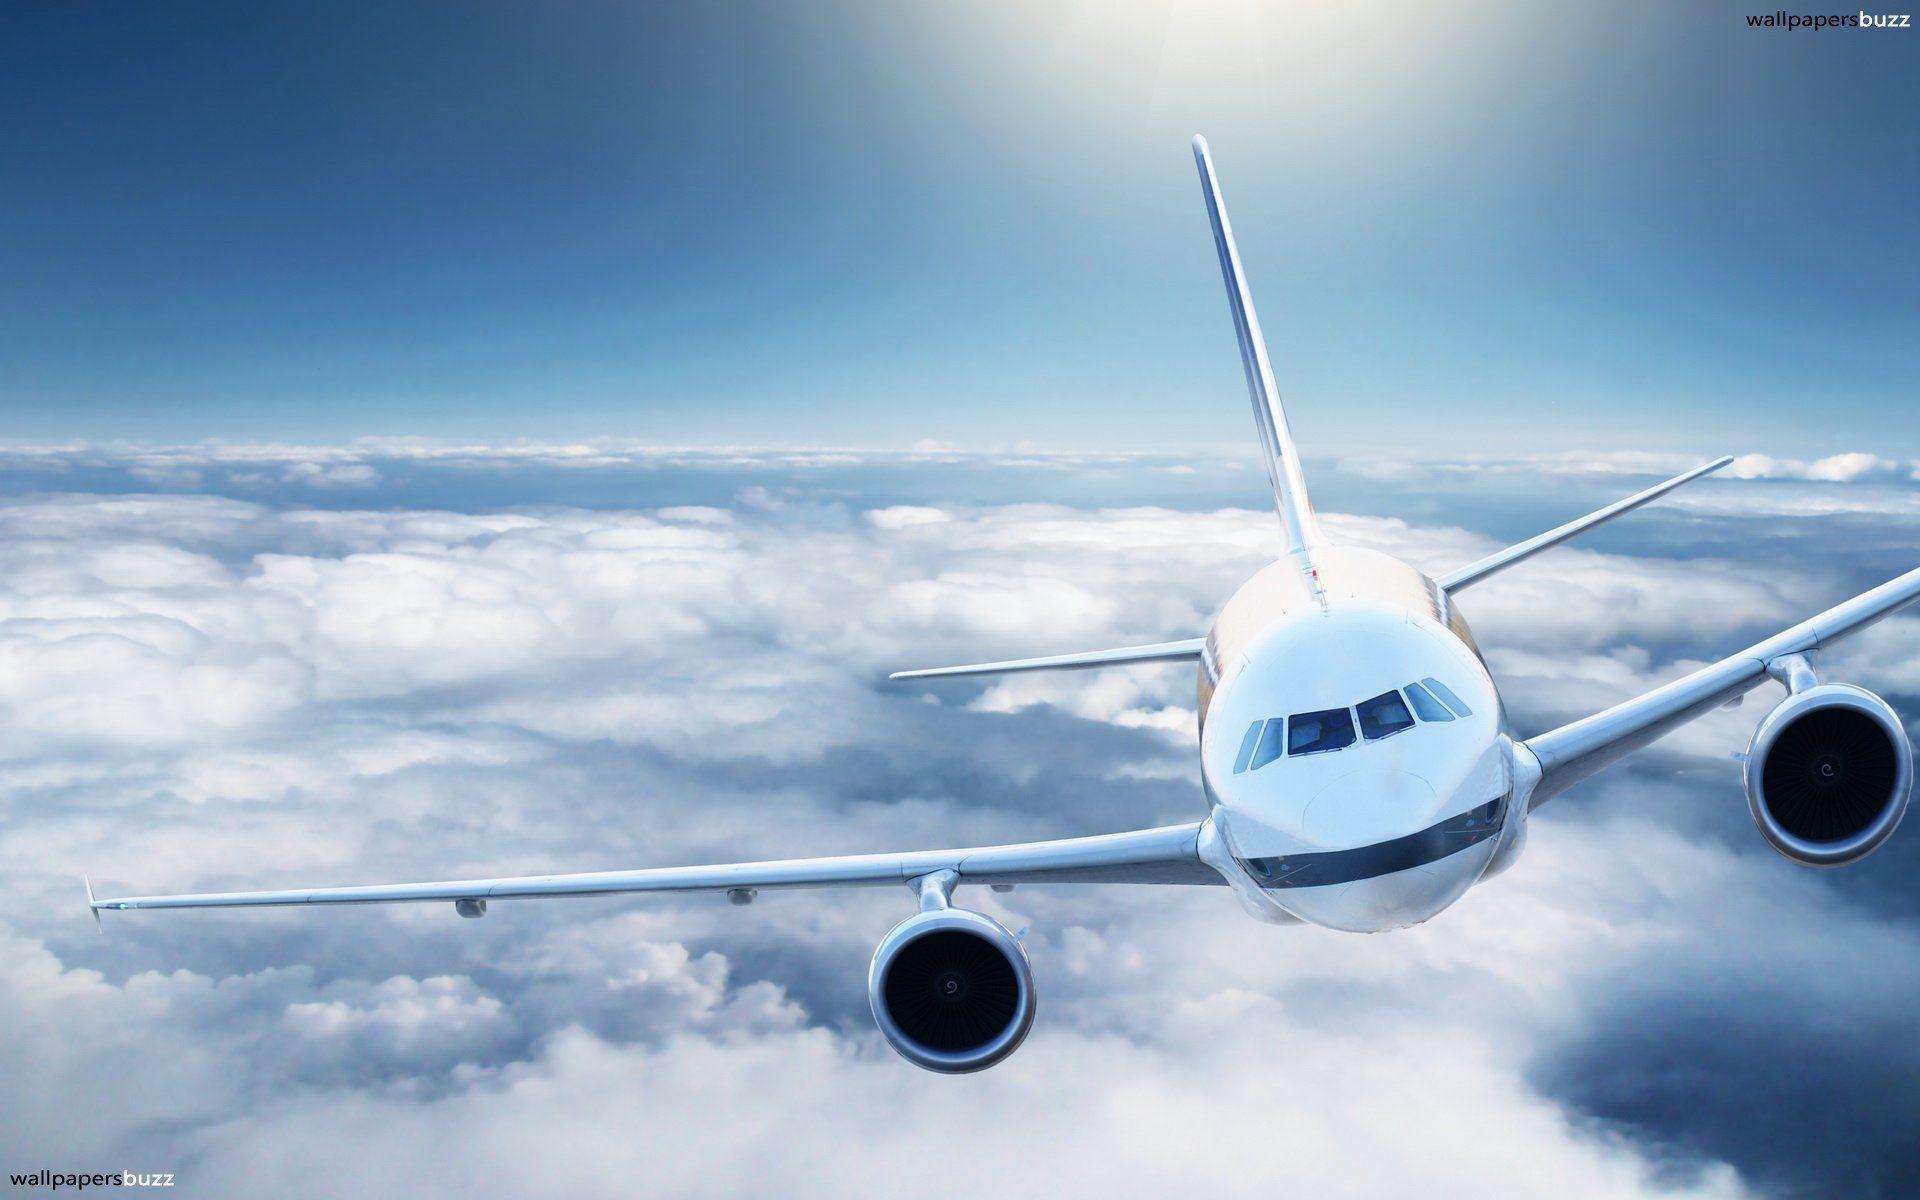 Aircraft Hd Wallpapers Top Free Aircraft Hd Backgrounds Wallpaperaccess